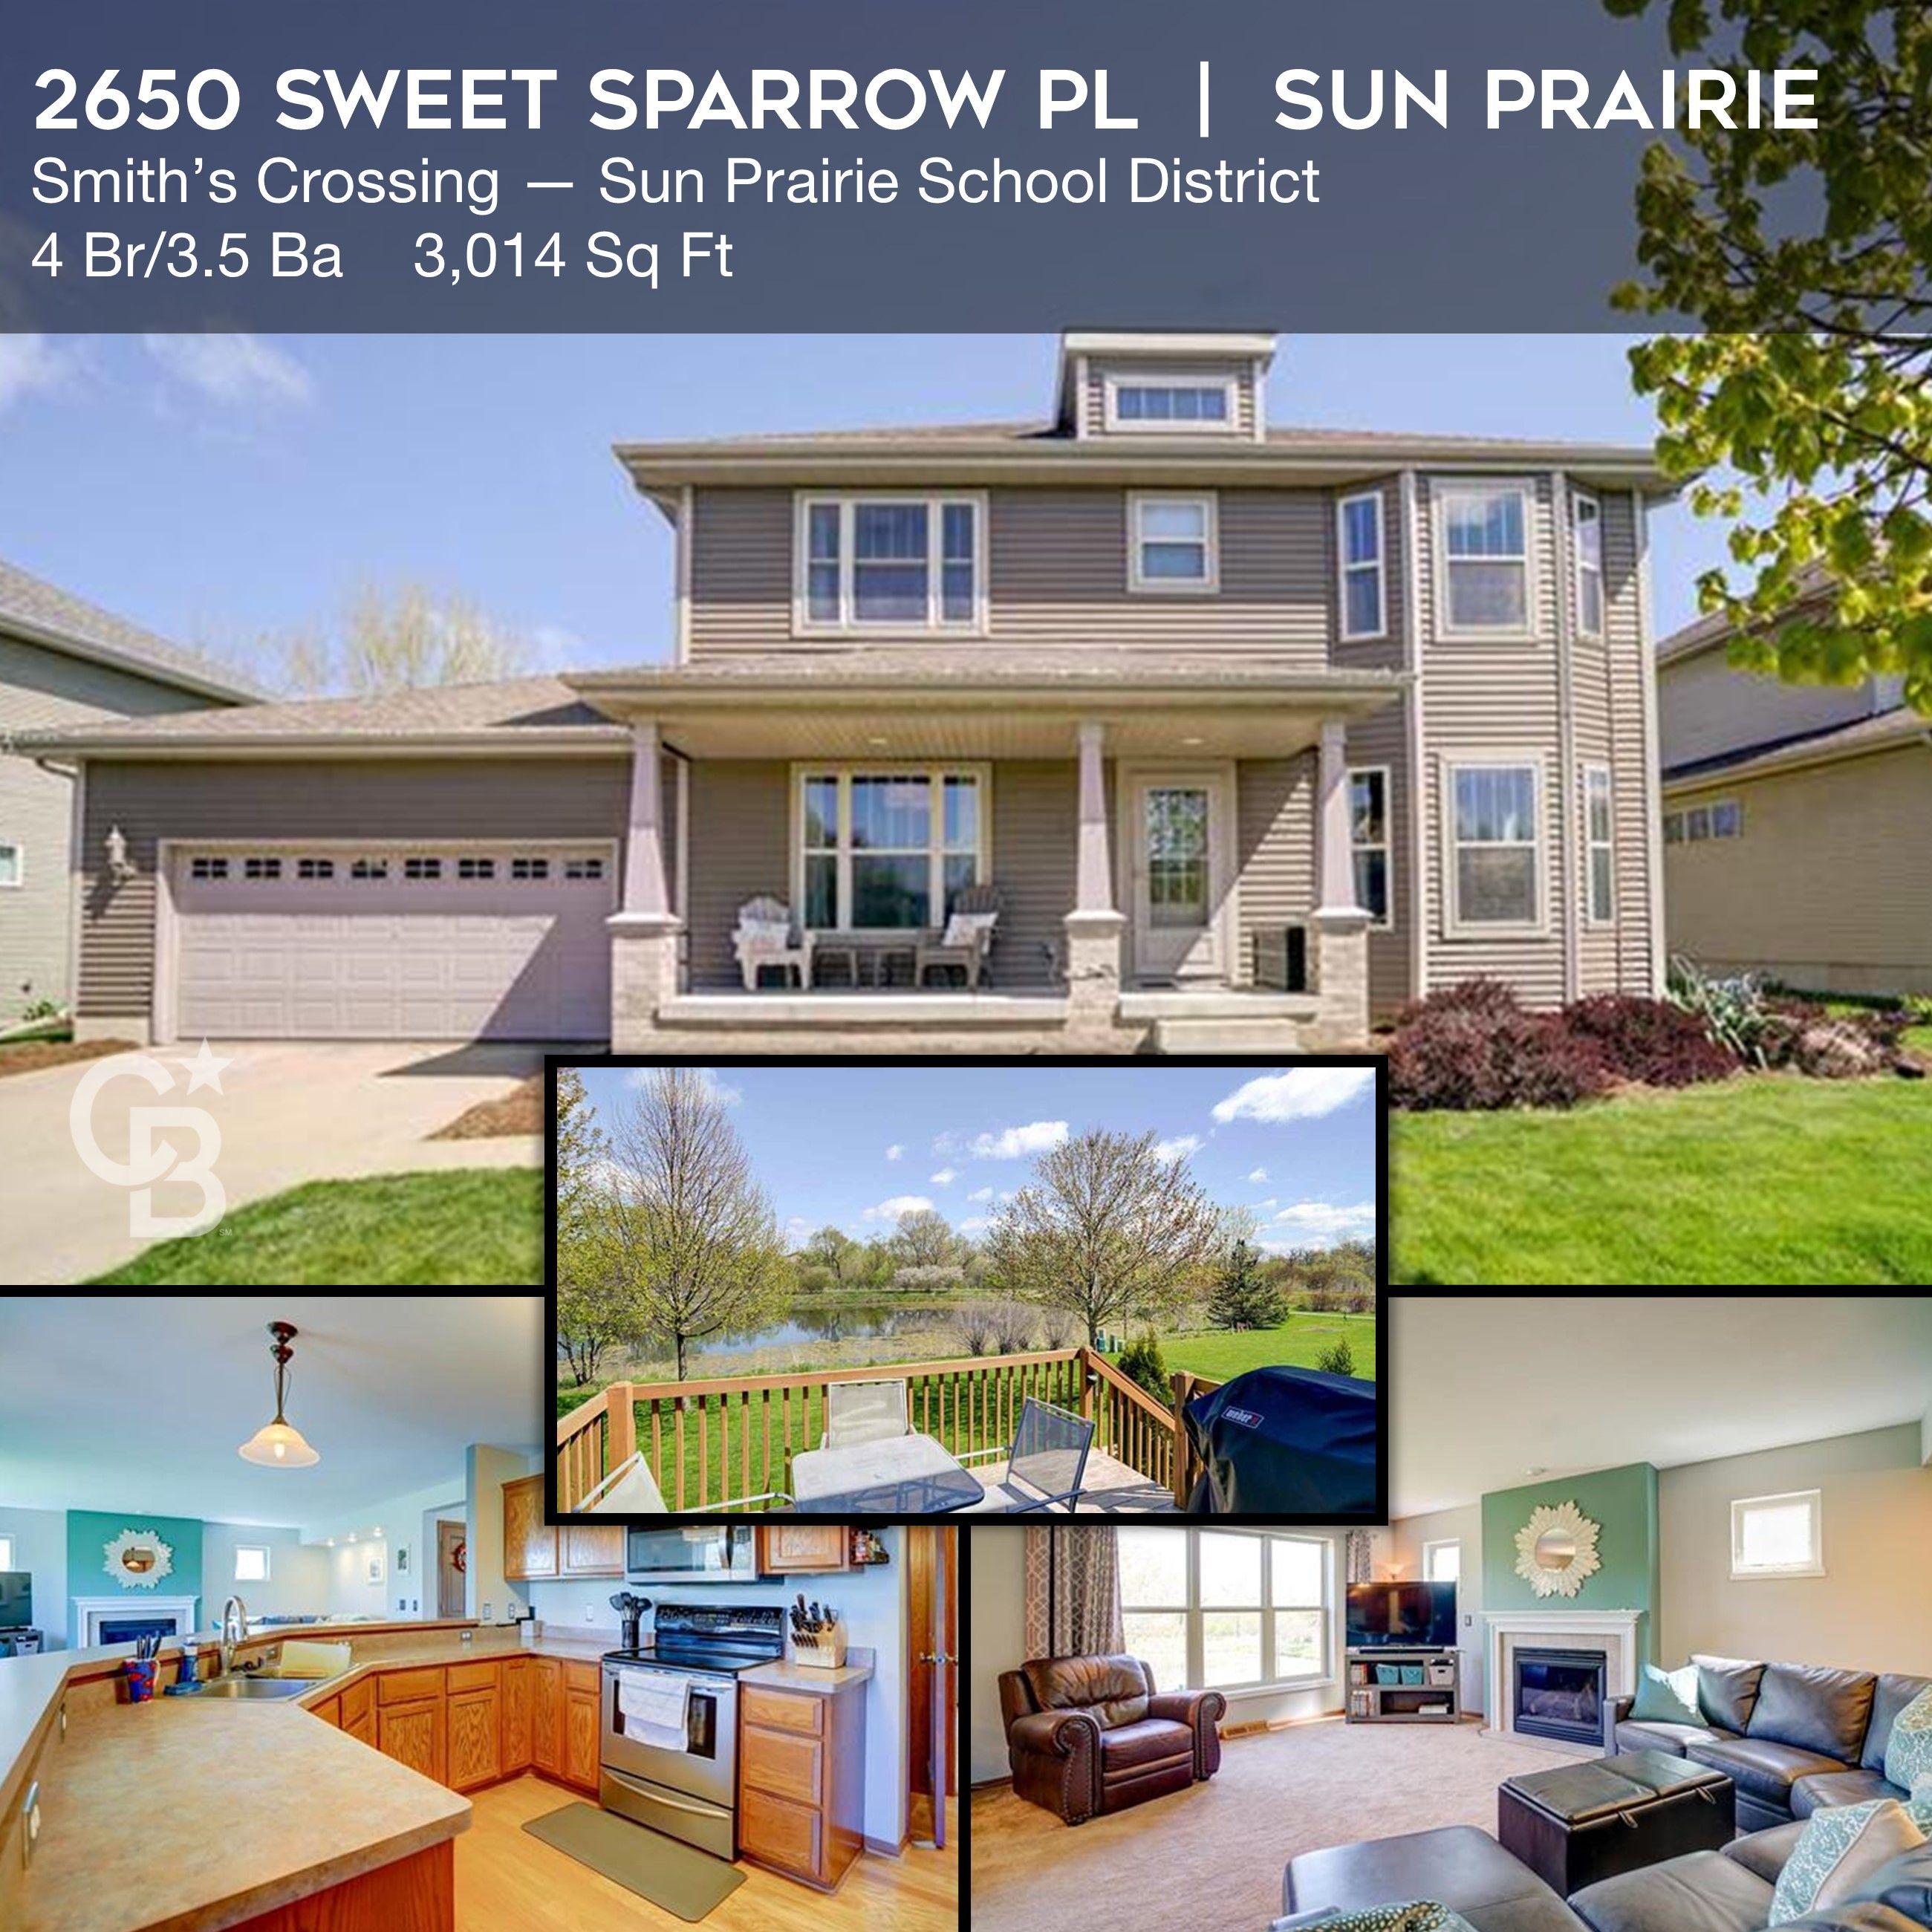 2650 sweet sparrow pl sun prairie wi in 2020 condos